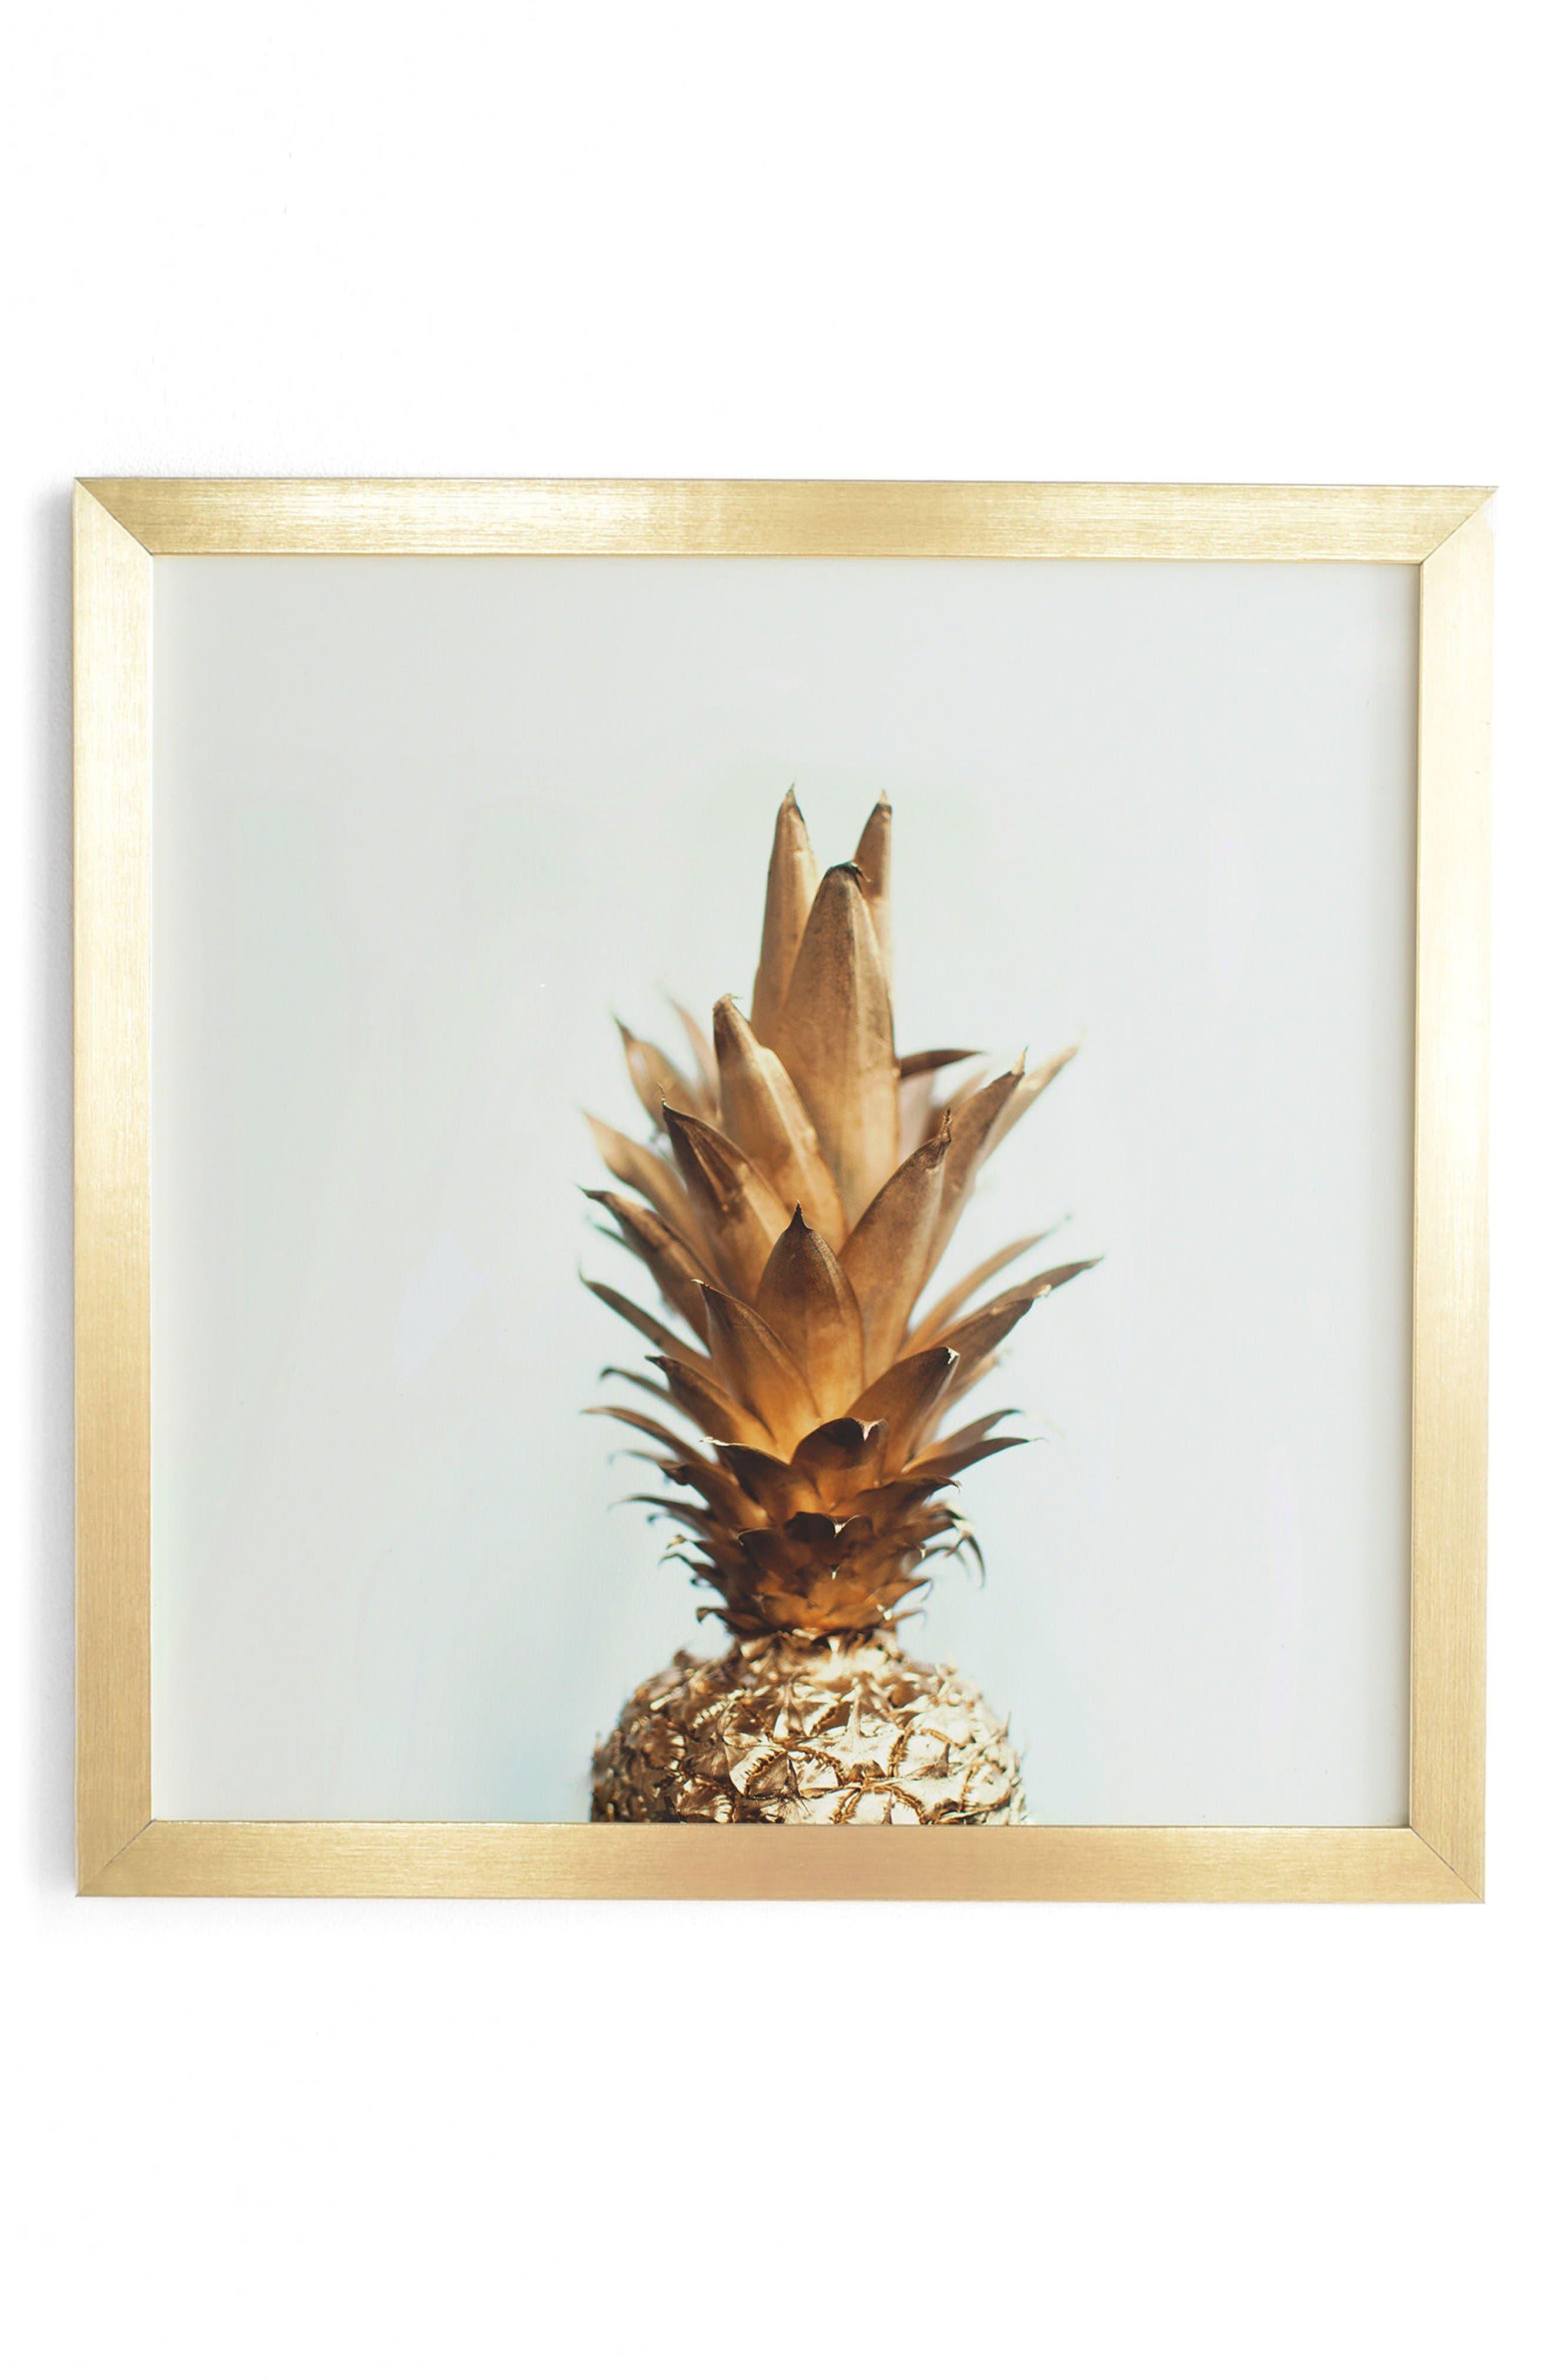 Alternate Image 1 Selected - DENY Designs The Gold Pineapple Framed Wall Art